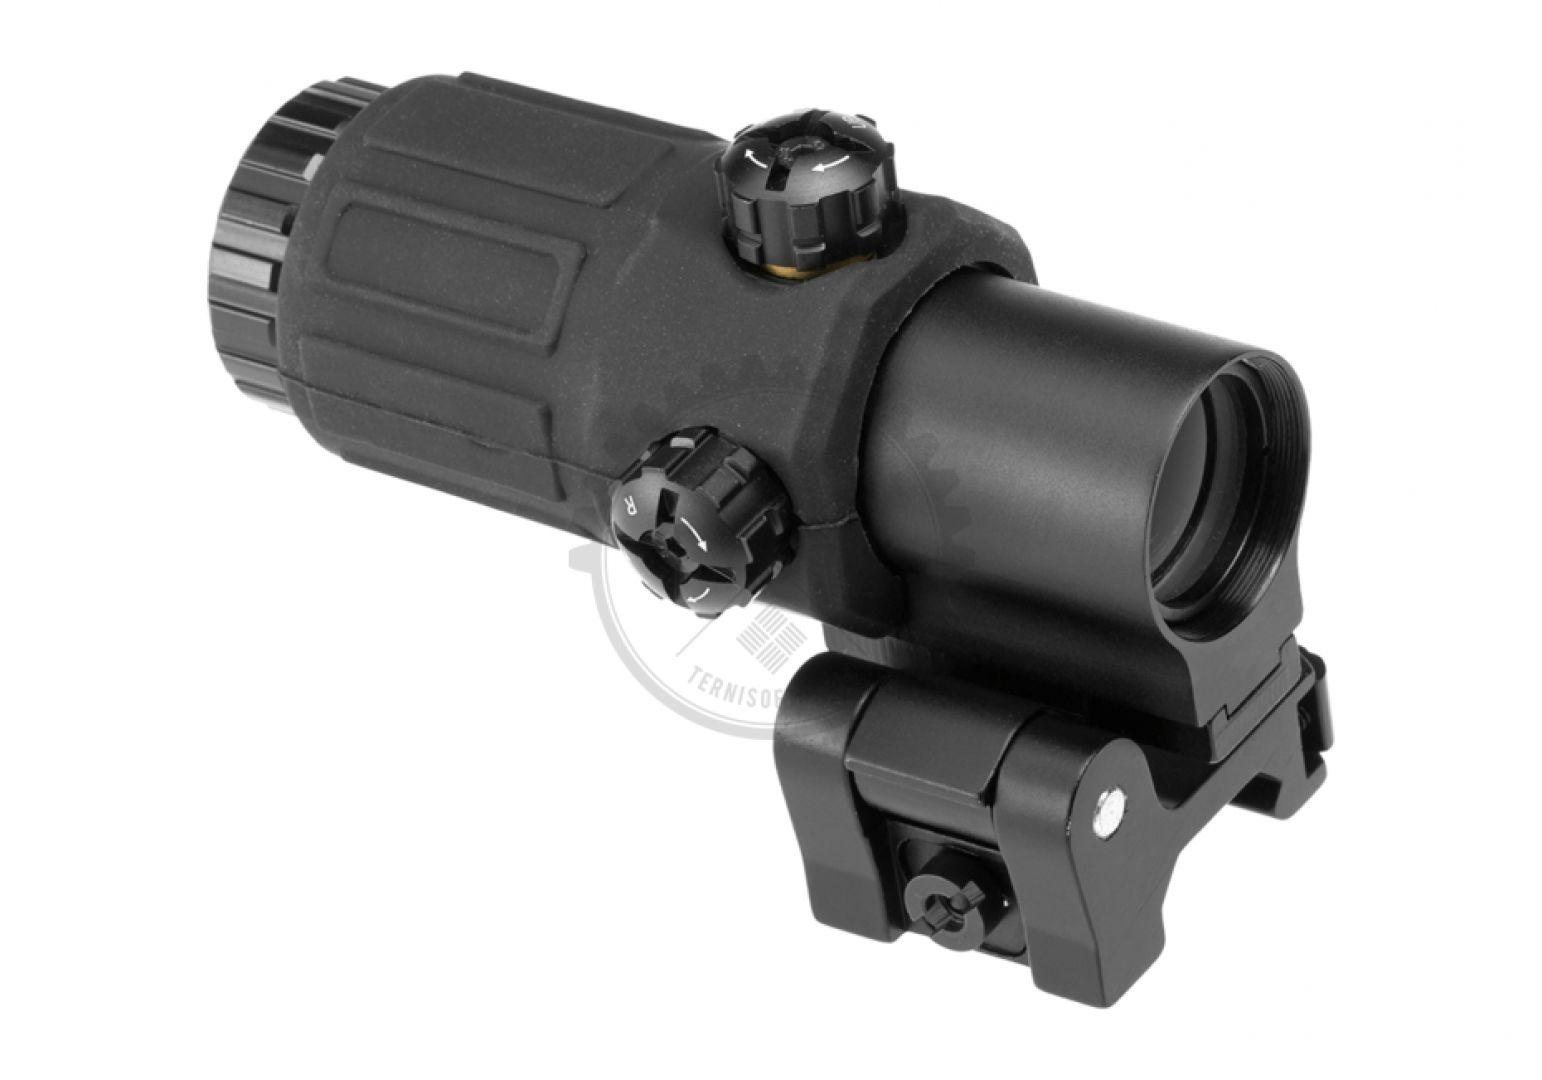 Magnifier 3x G33